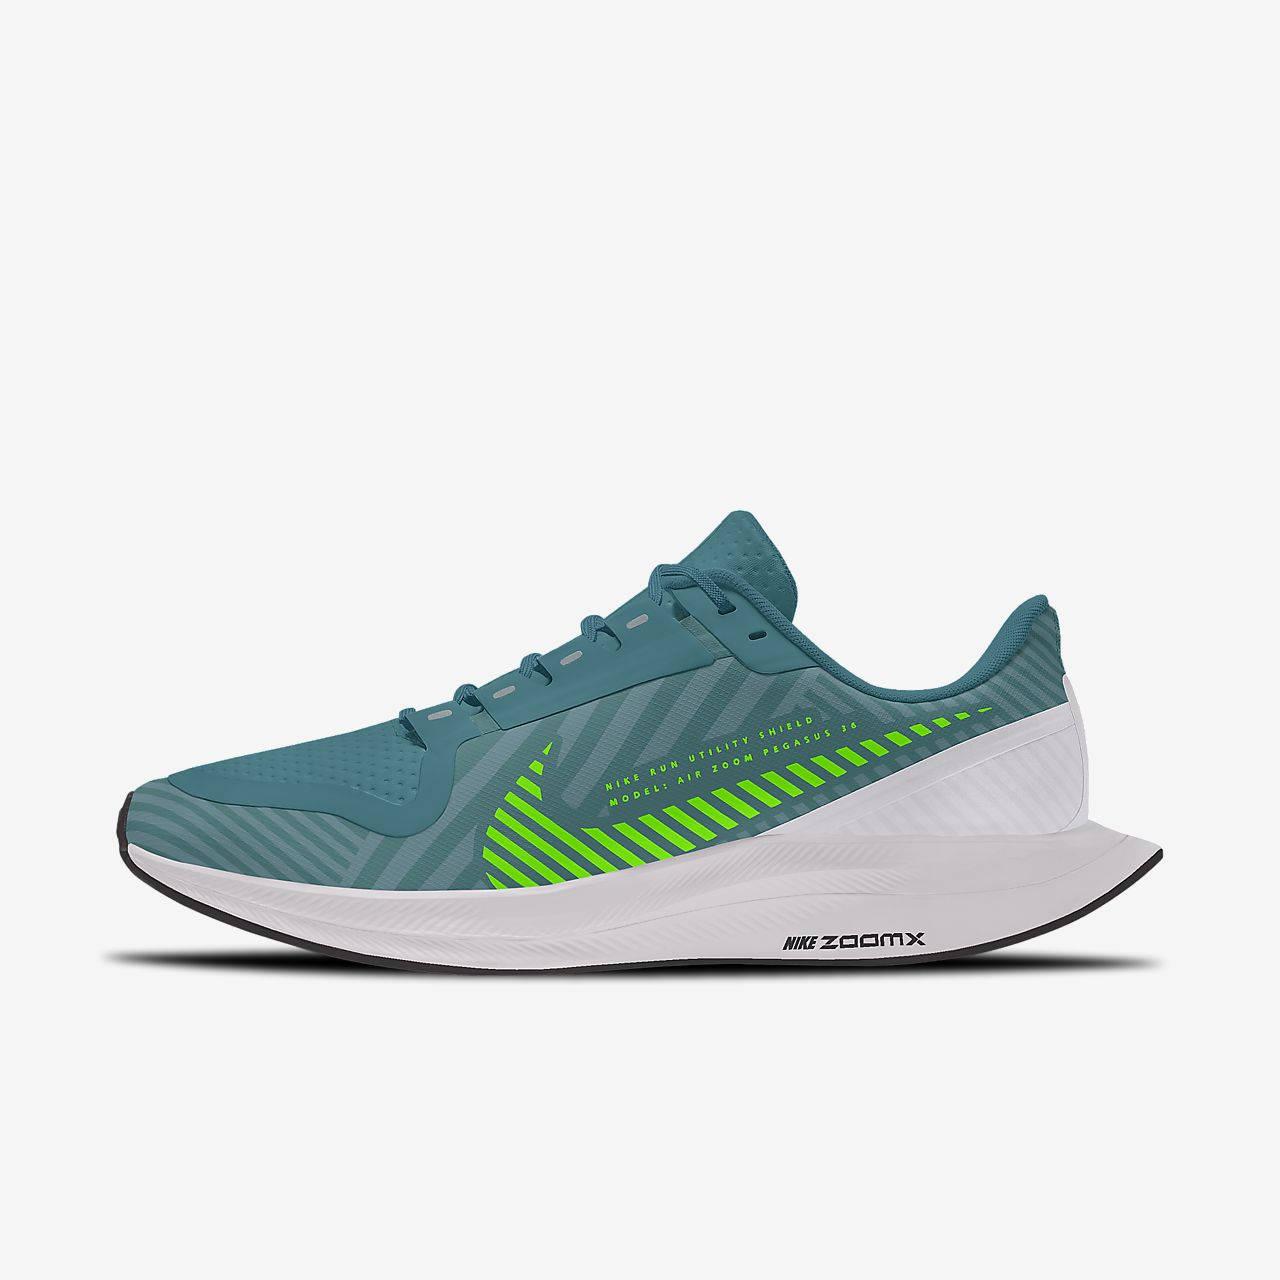 Scarpa da running personalizzabile Nike Zoom Pegasus Turbo 2 Shield Low By You - Uomo